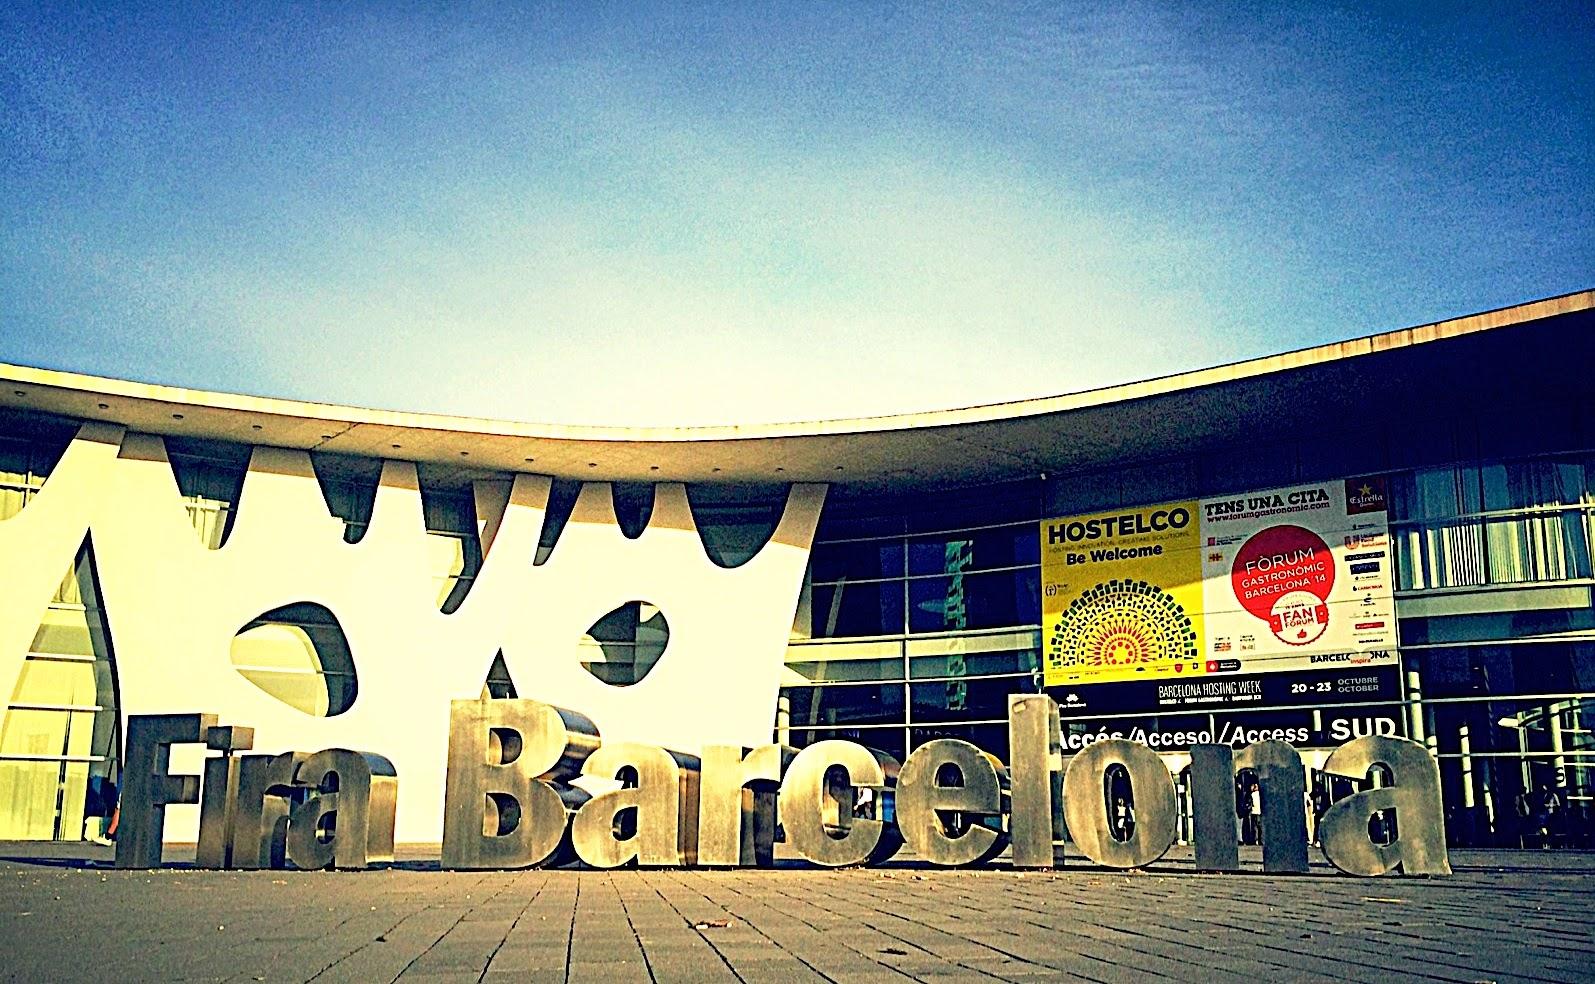 Fòrum Gastronòmic Barcelona 2014